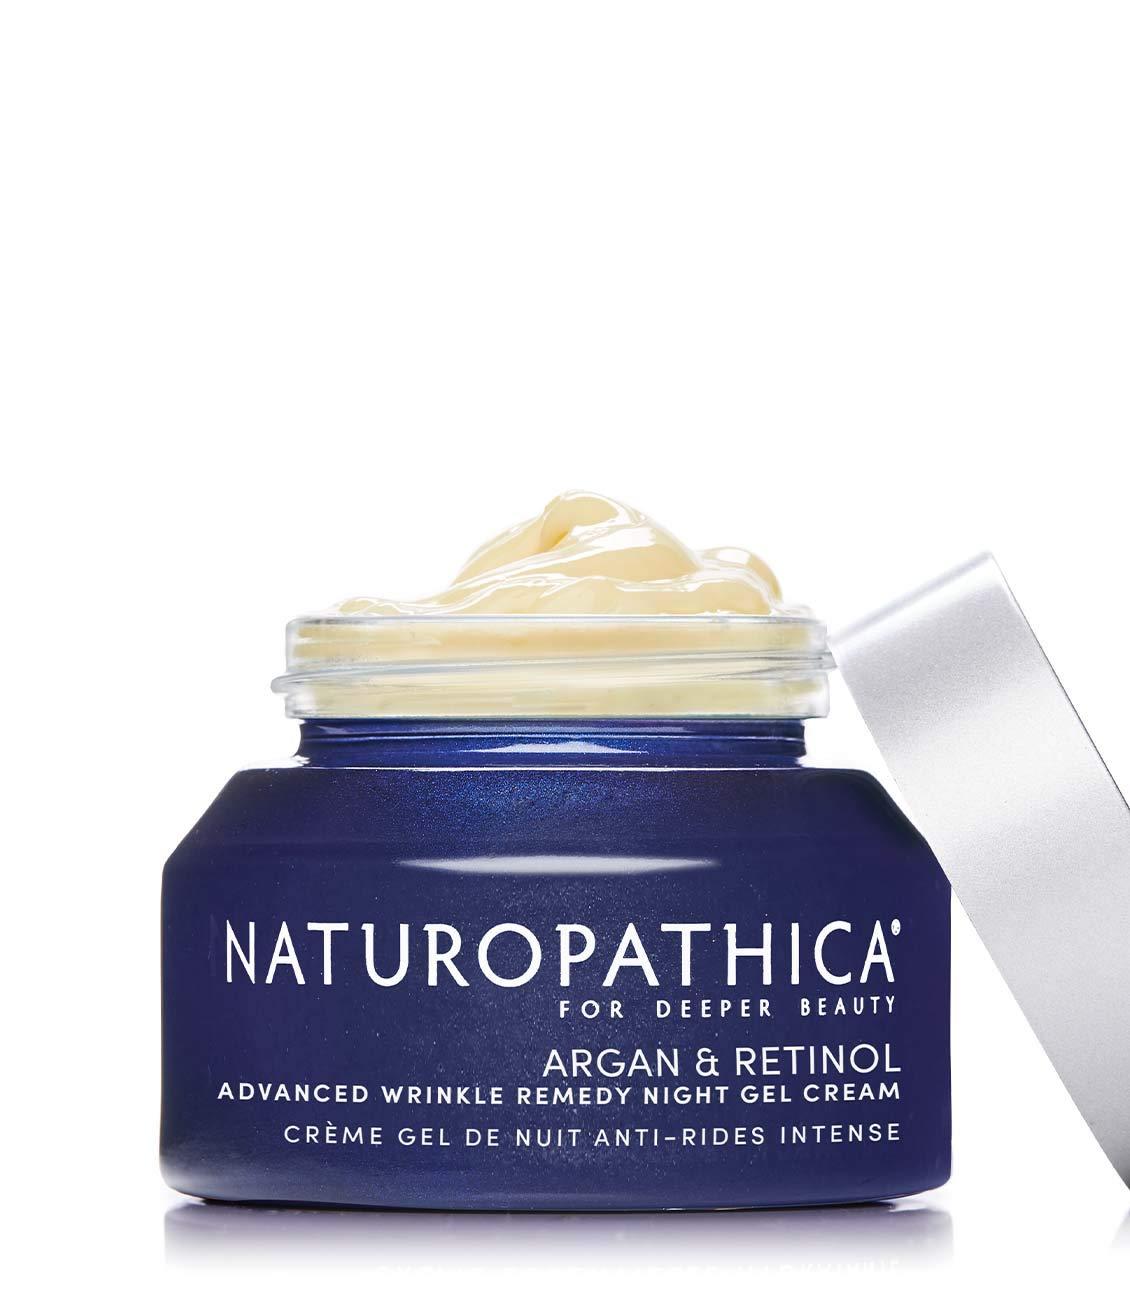 Naturopathica Argan & Retinol Wrinkle Repair Night Cream - Non-irritating Nighttime Facial Moisturizer - Vegan, Made in USA